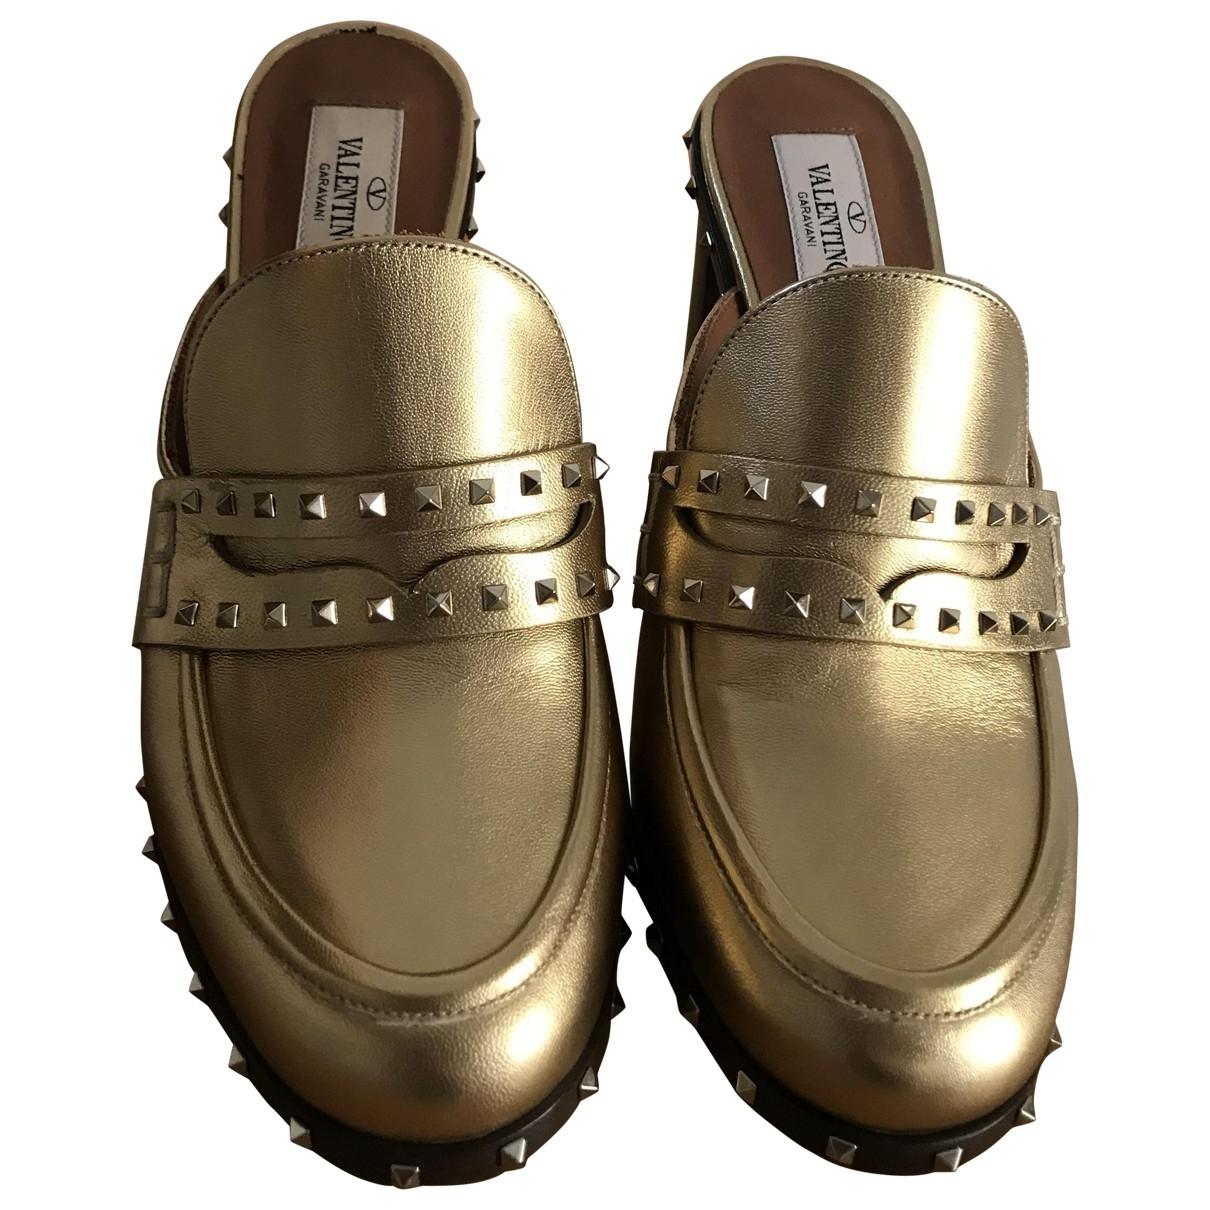 Valentino Garavani Rockstud Gold Leather Flats for Women 36 EU